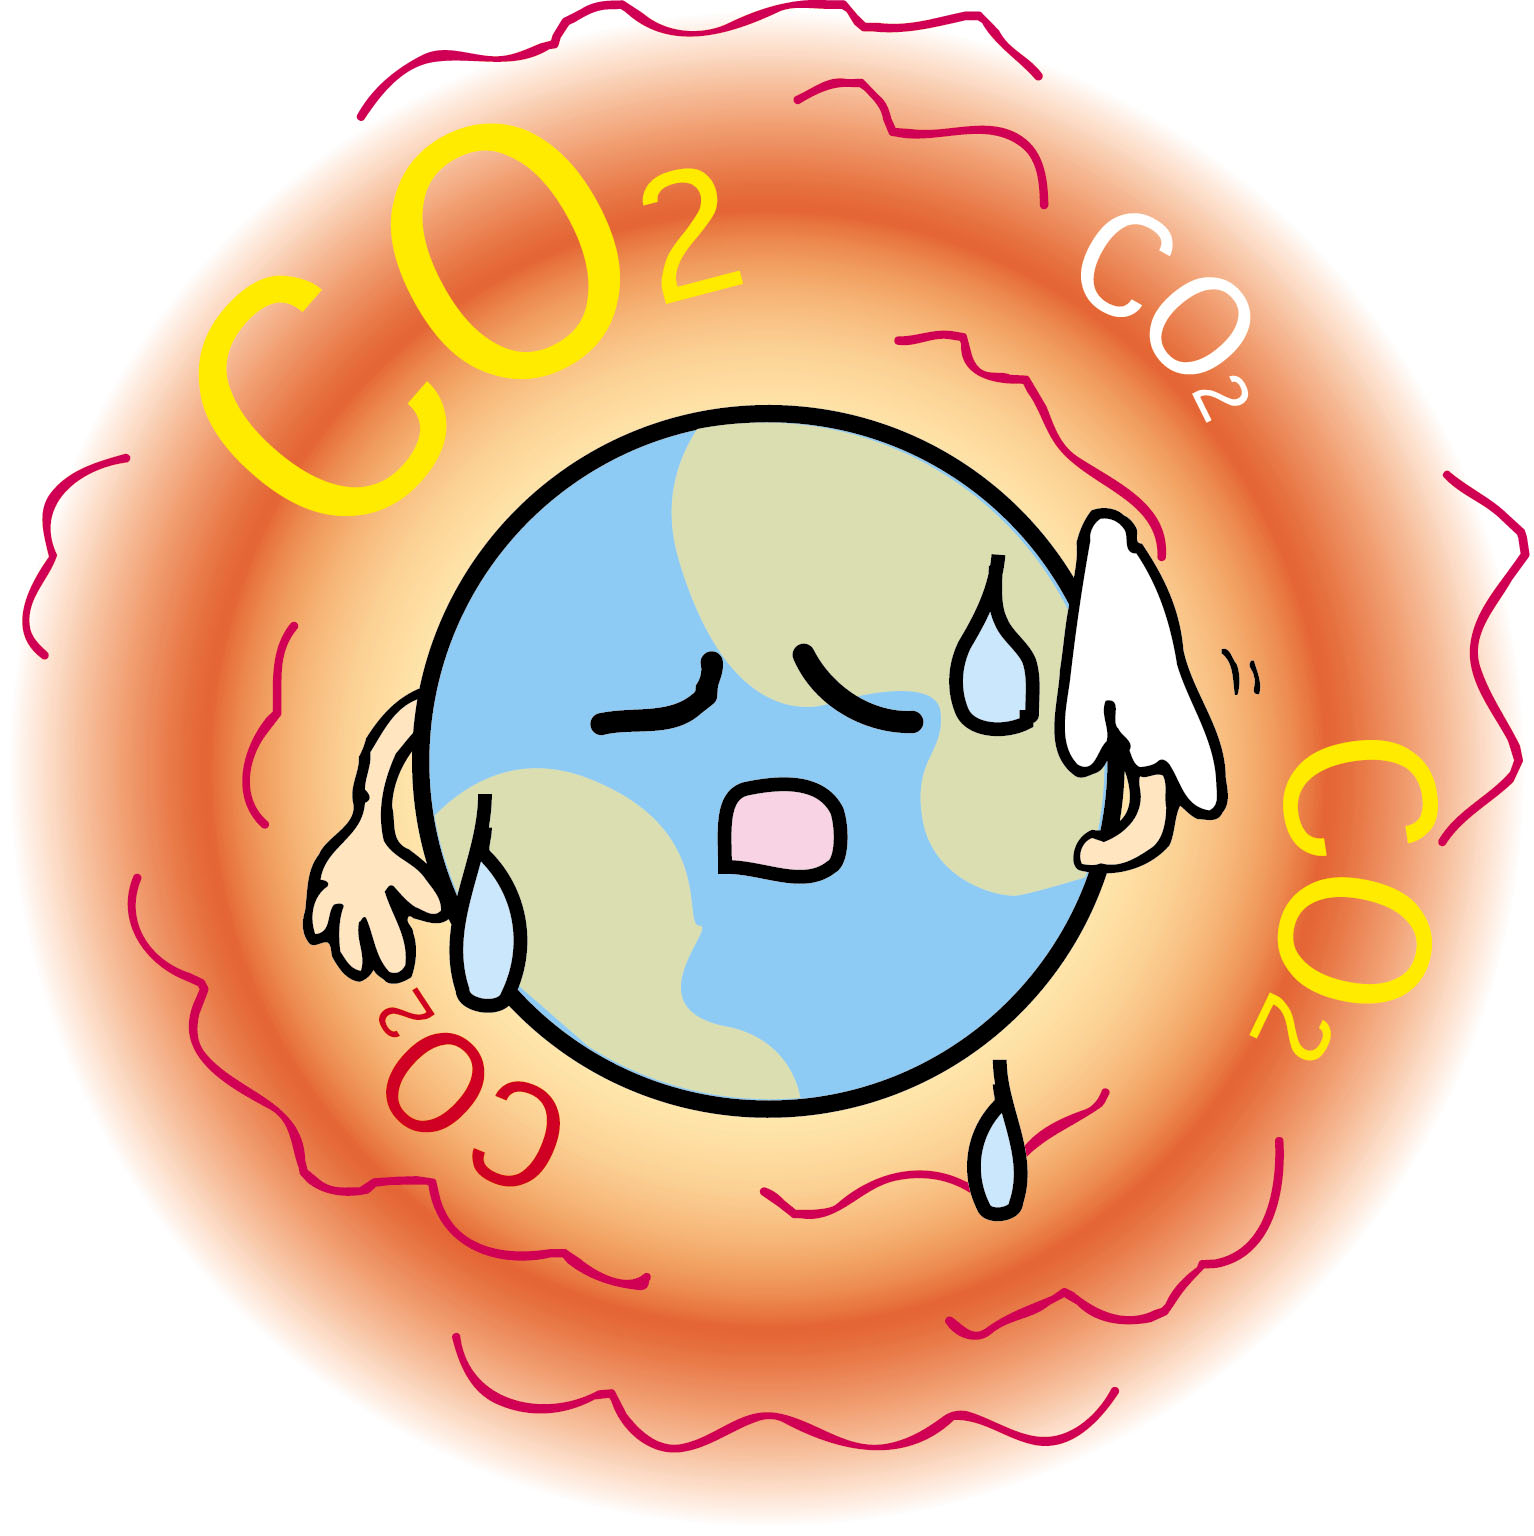 Global Warming Clip Art